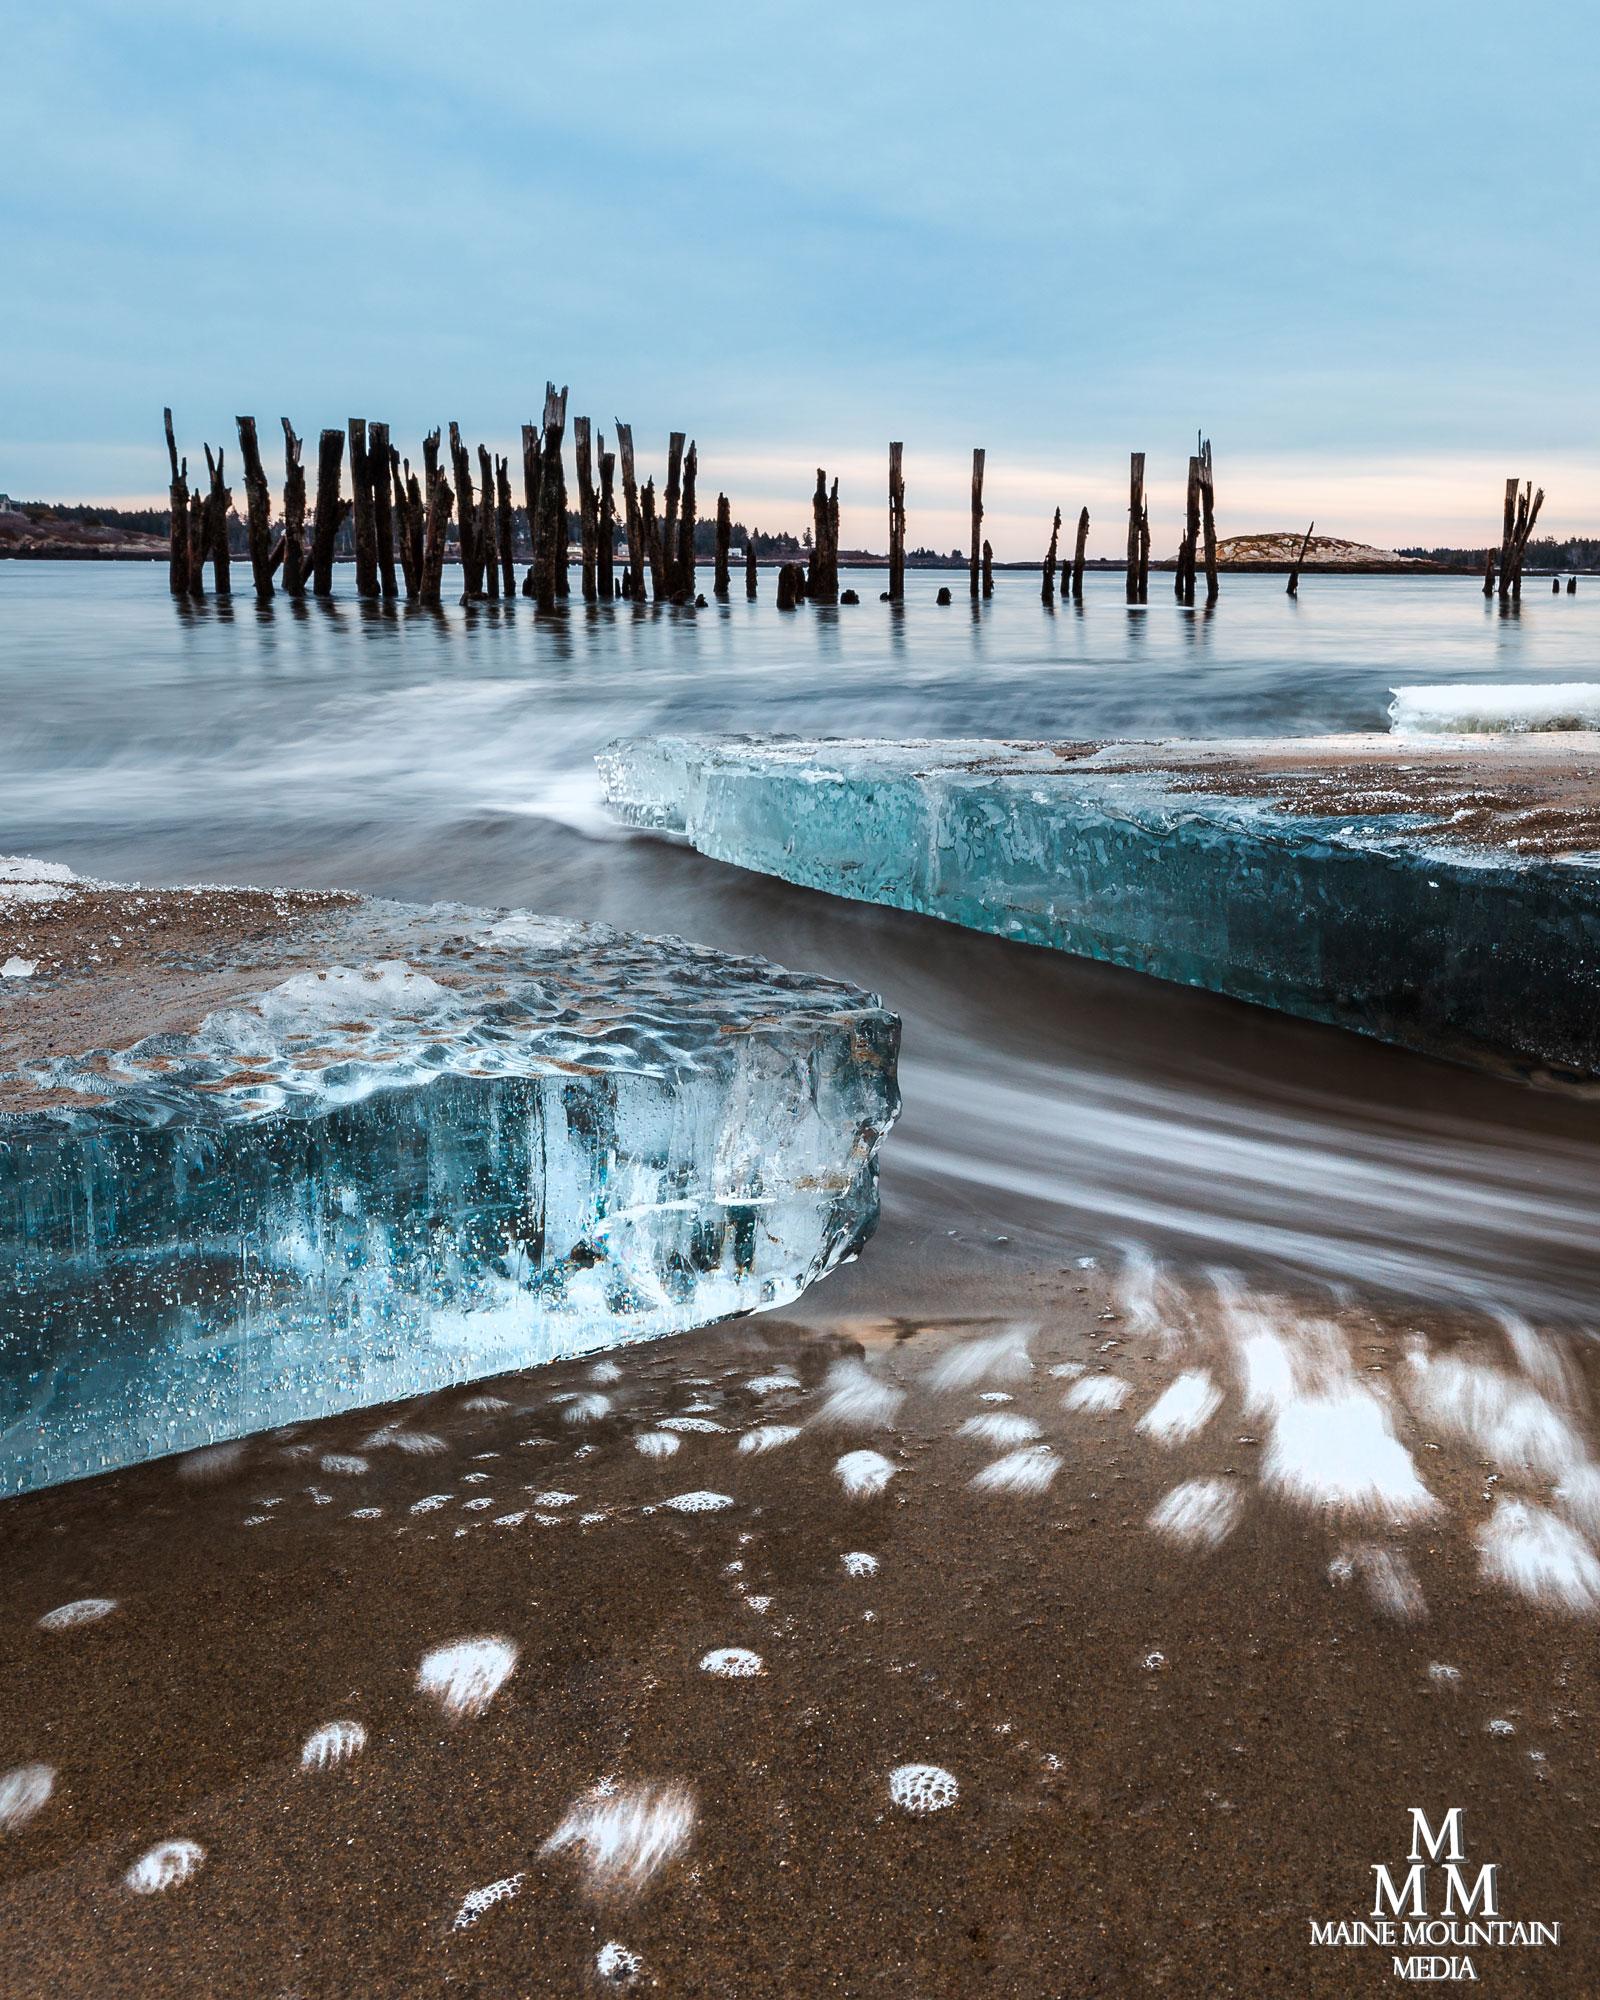 Maine Mountain Media, Fort Popham Ice